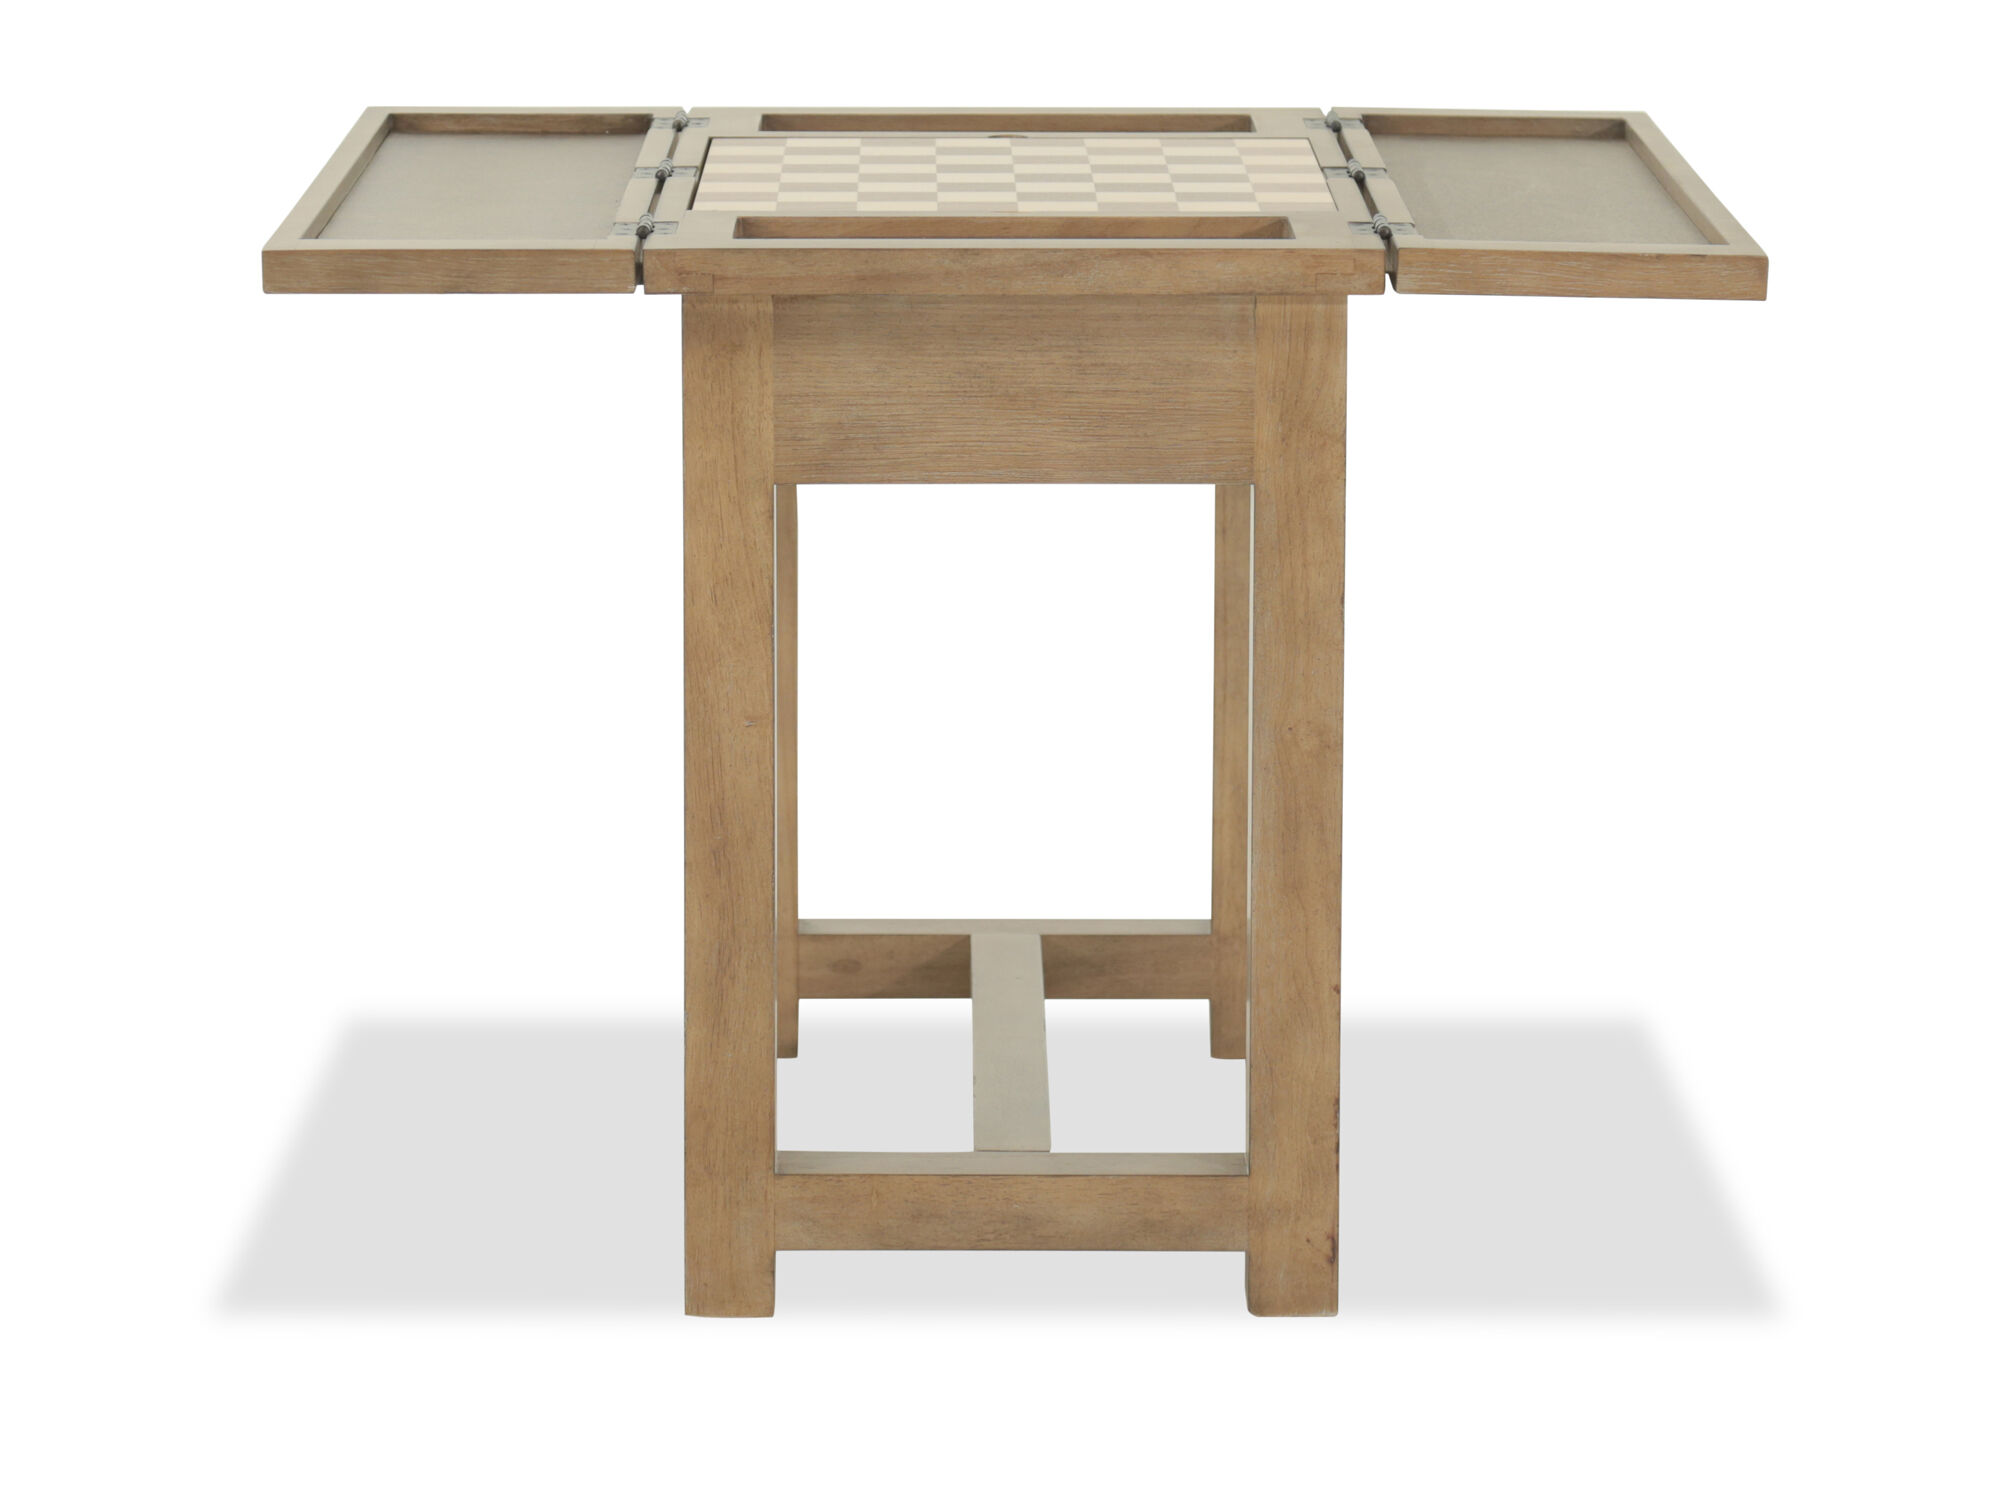 Images Mid Century Modern Rectangular Game Table In Light Brown Mid Century  Modern Rectangular Game Table In Light Brown